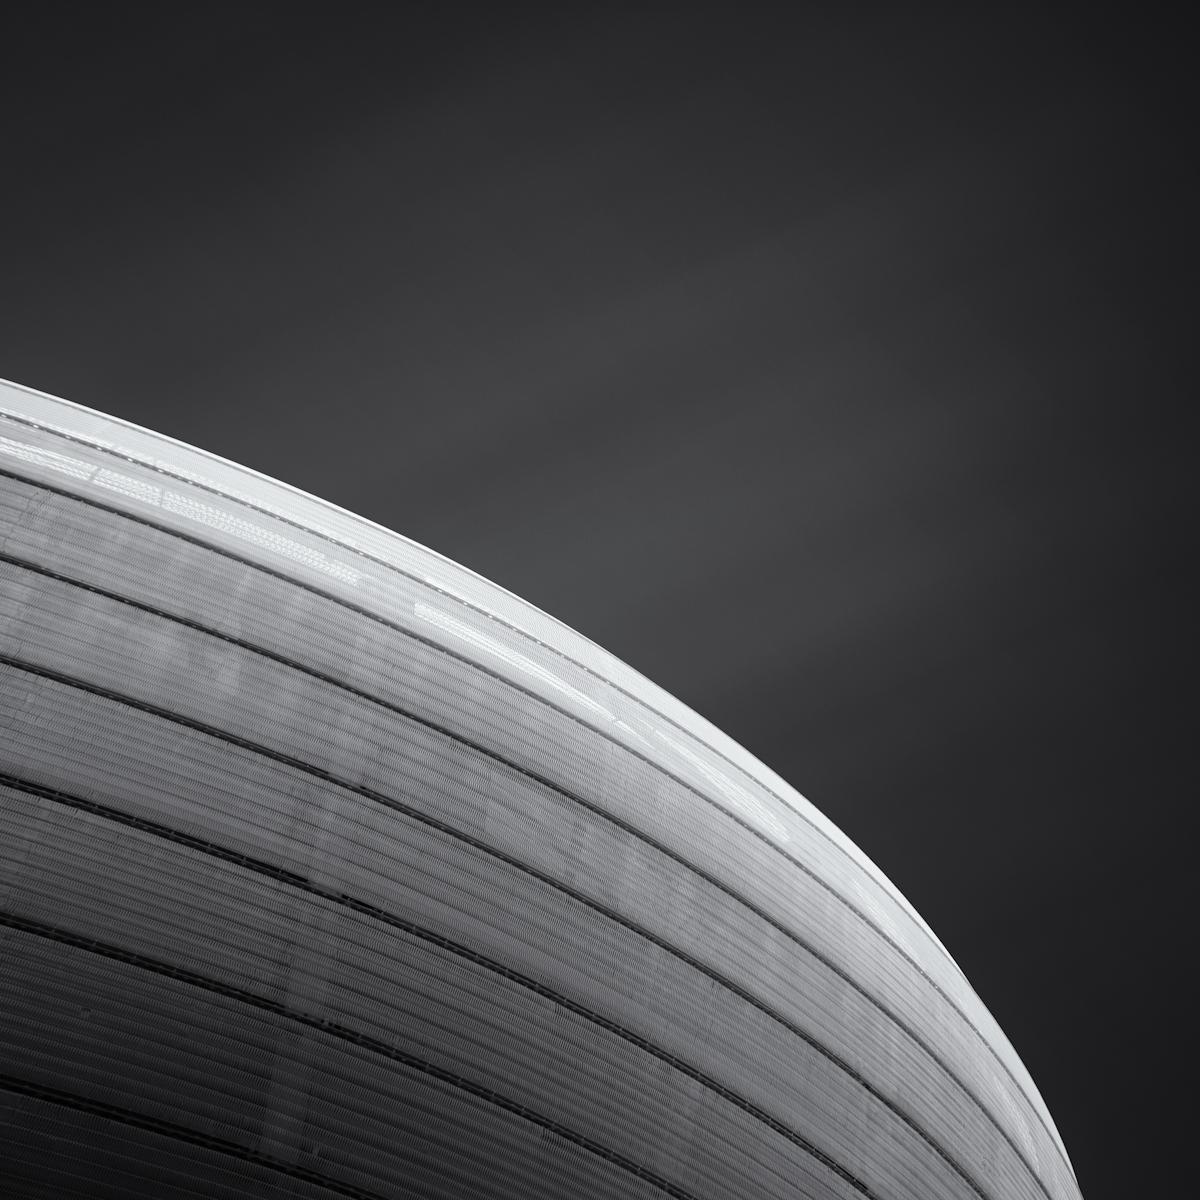 Fineart Architekturfotografie